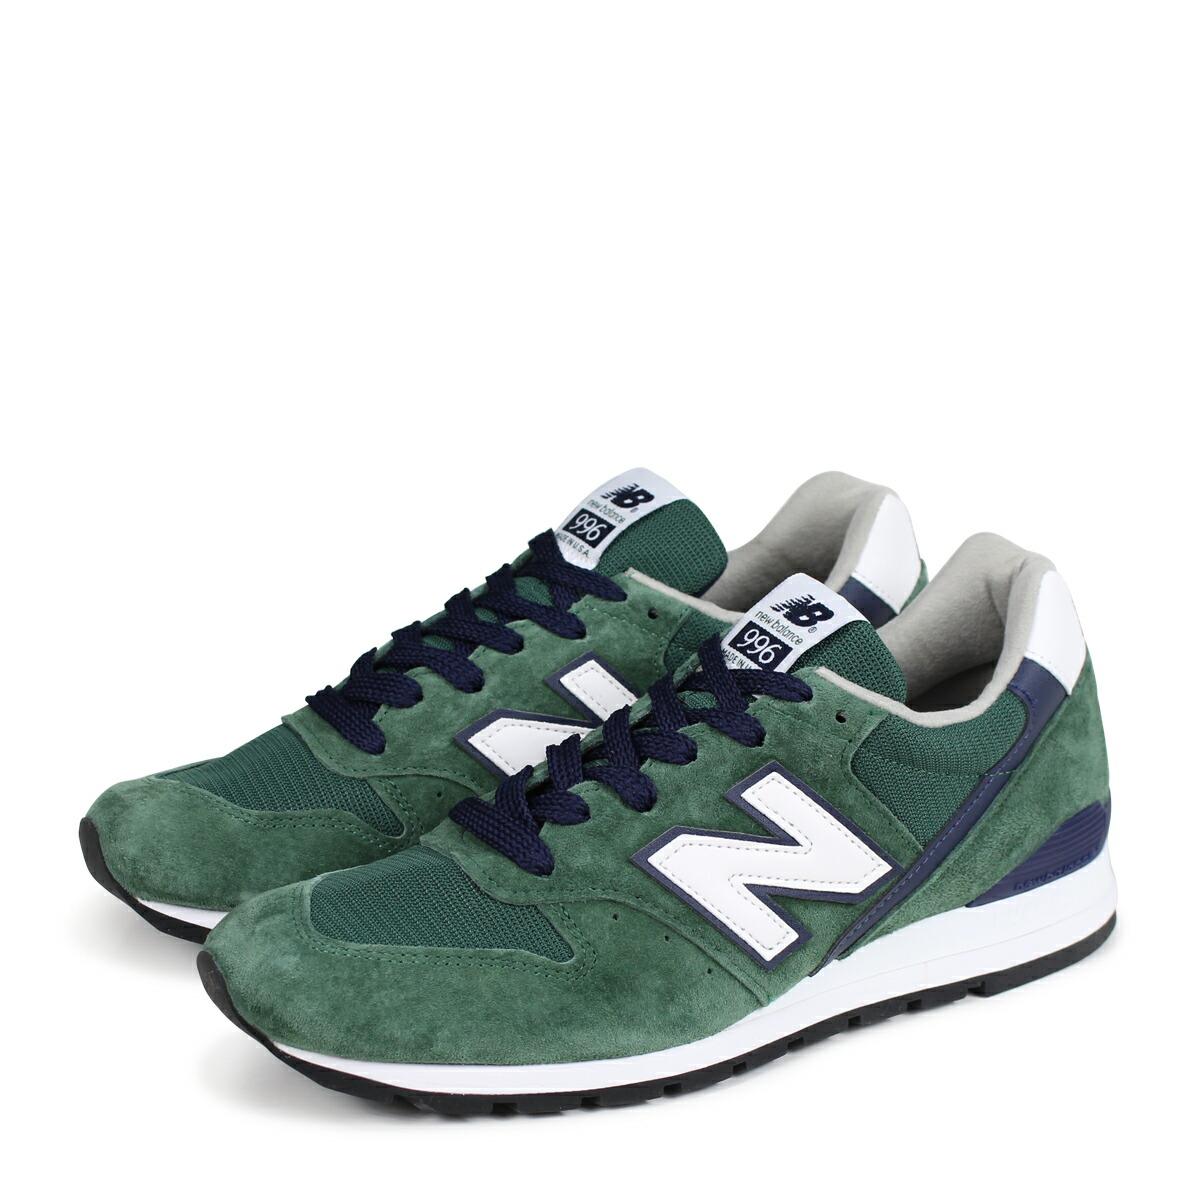 pretty nice 4bcb7 1e494 new balance 996 New Balance sneakers USA M996CSL D Wise men gap Dis shoes  green [186]